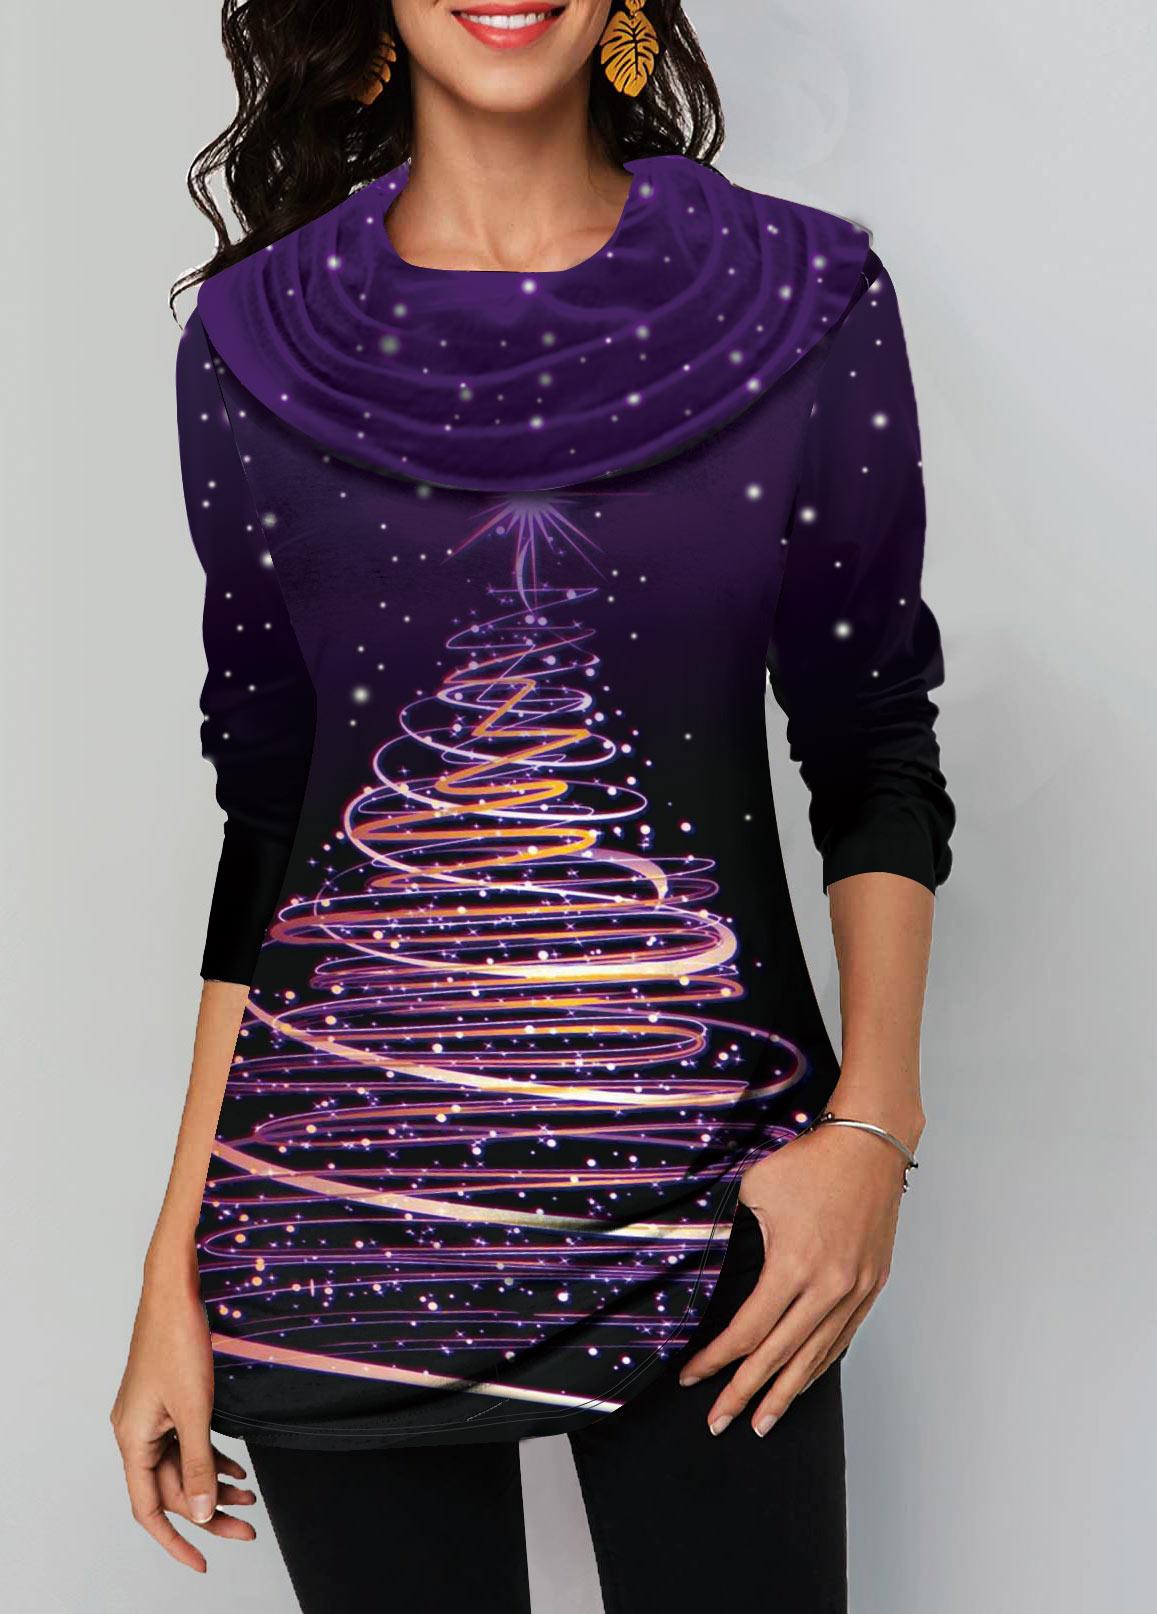 Dazzle Color Long Sleeve Christmas Print T Shirt